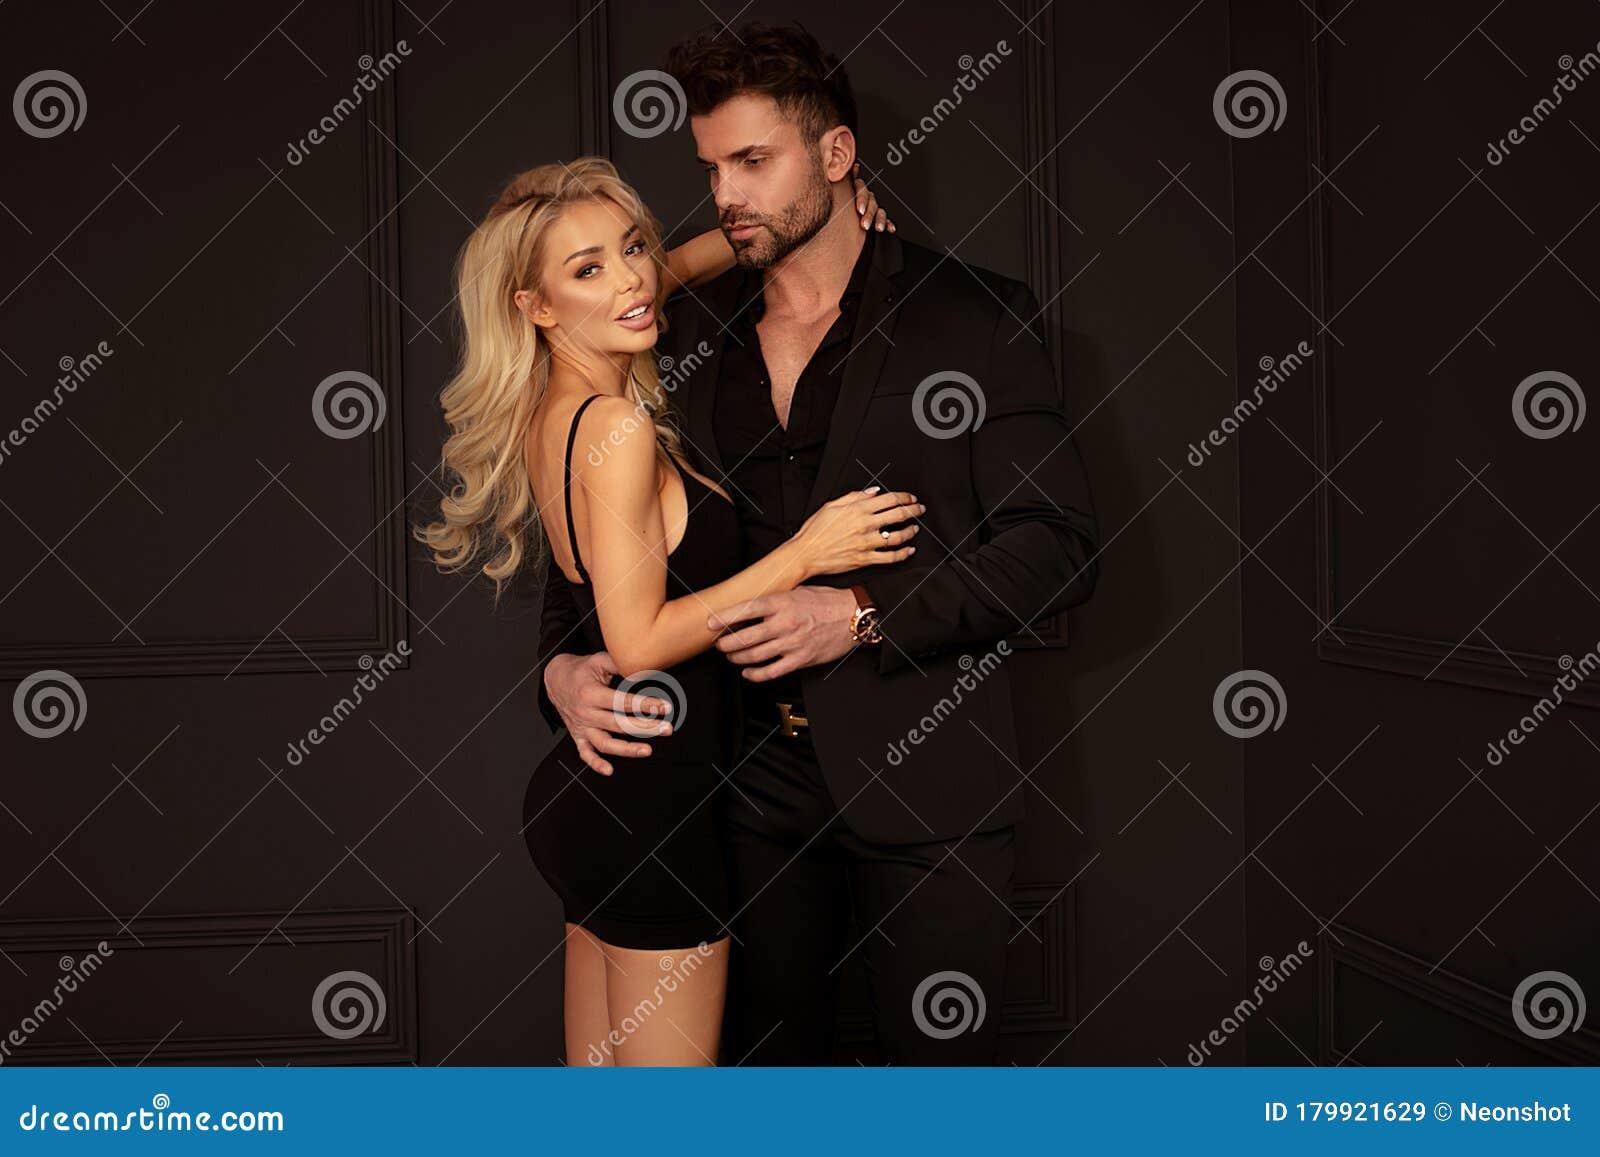 Sexiest Couple 1